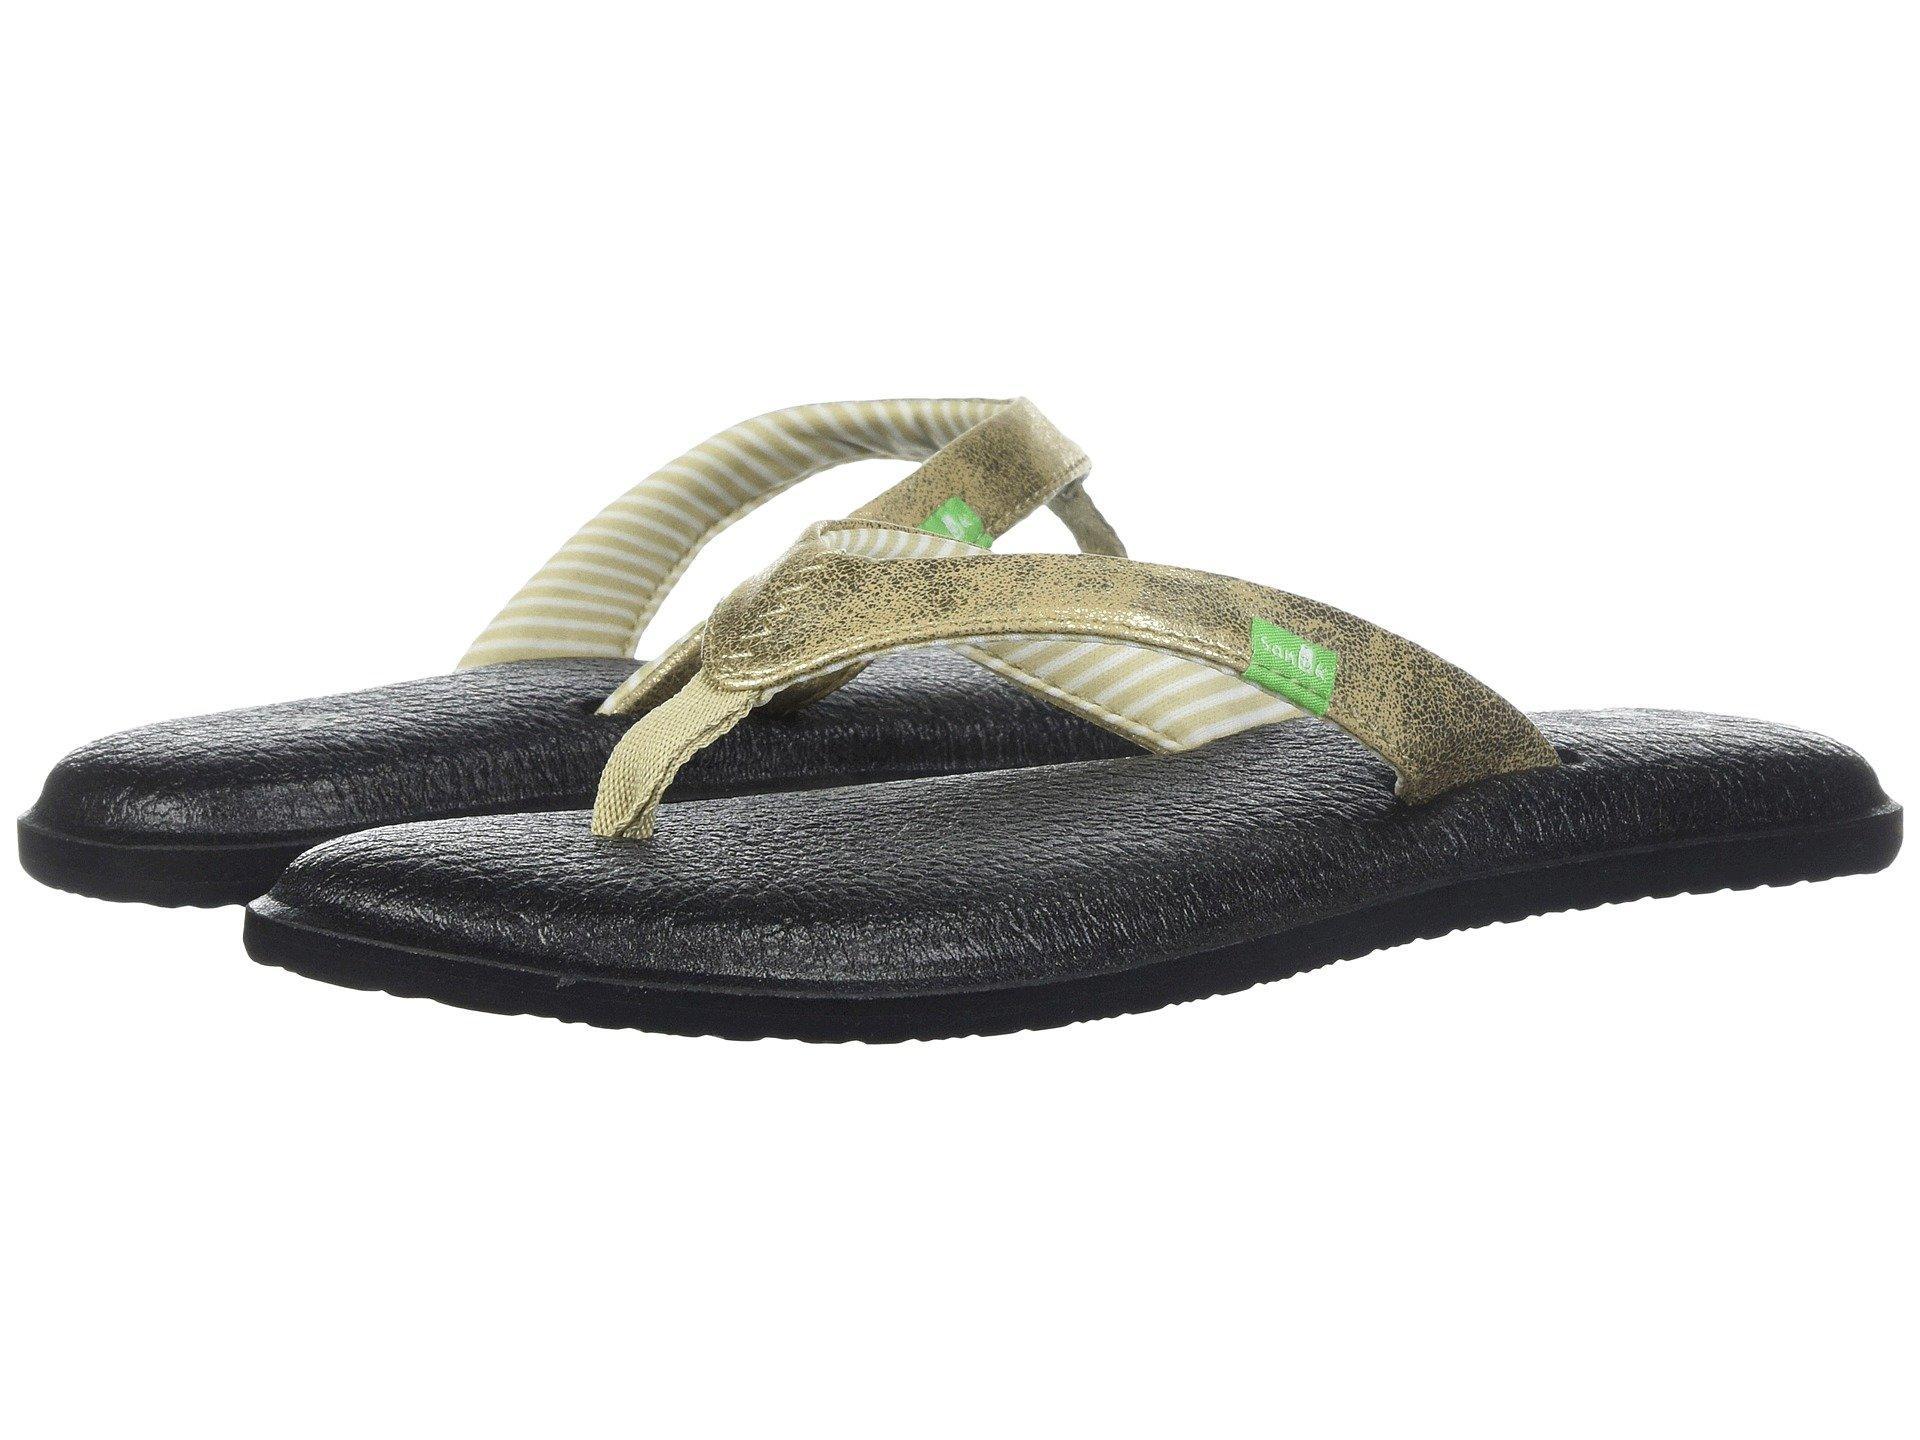 bd86bba6f36 Lyst - Sanuk Yoga Chakra Metallic (silver 2) Women s Sandals